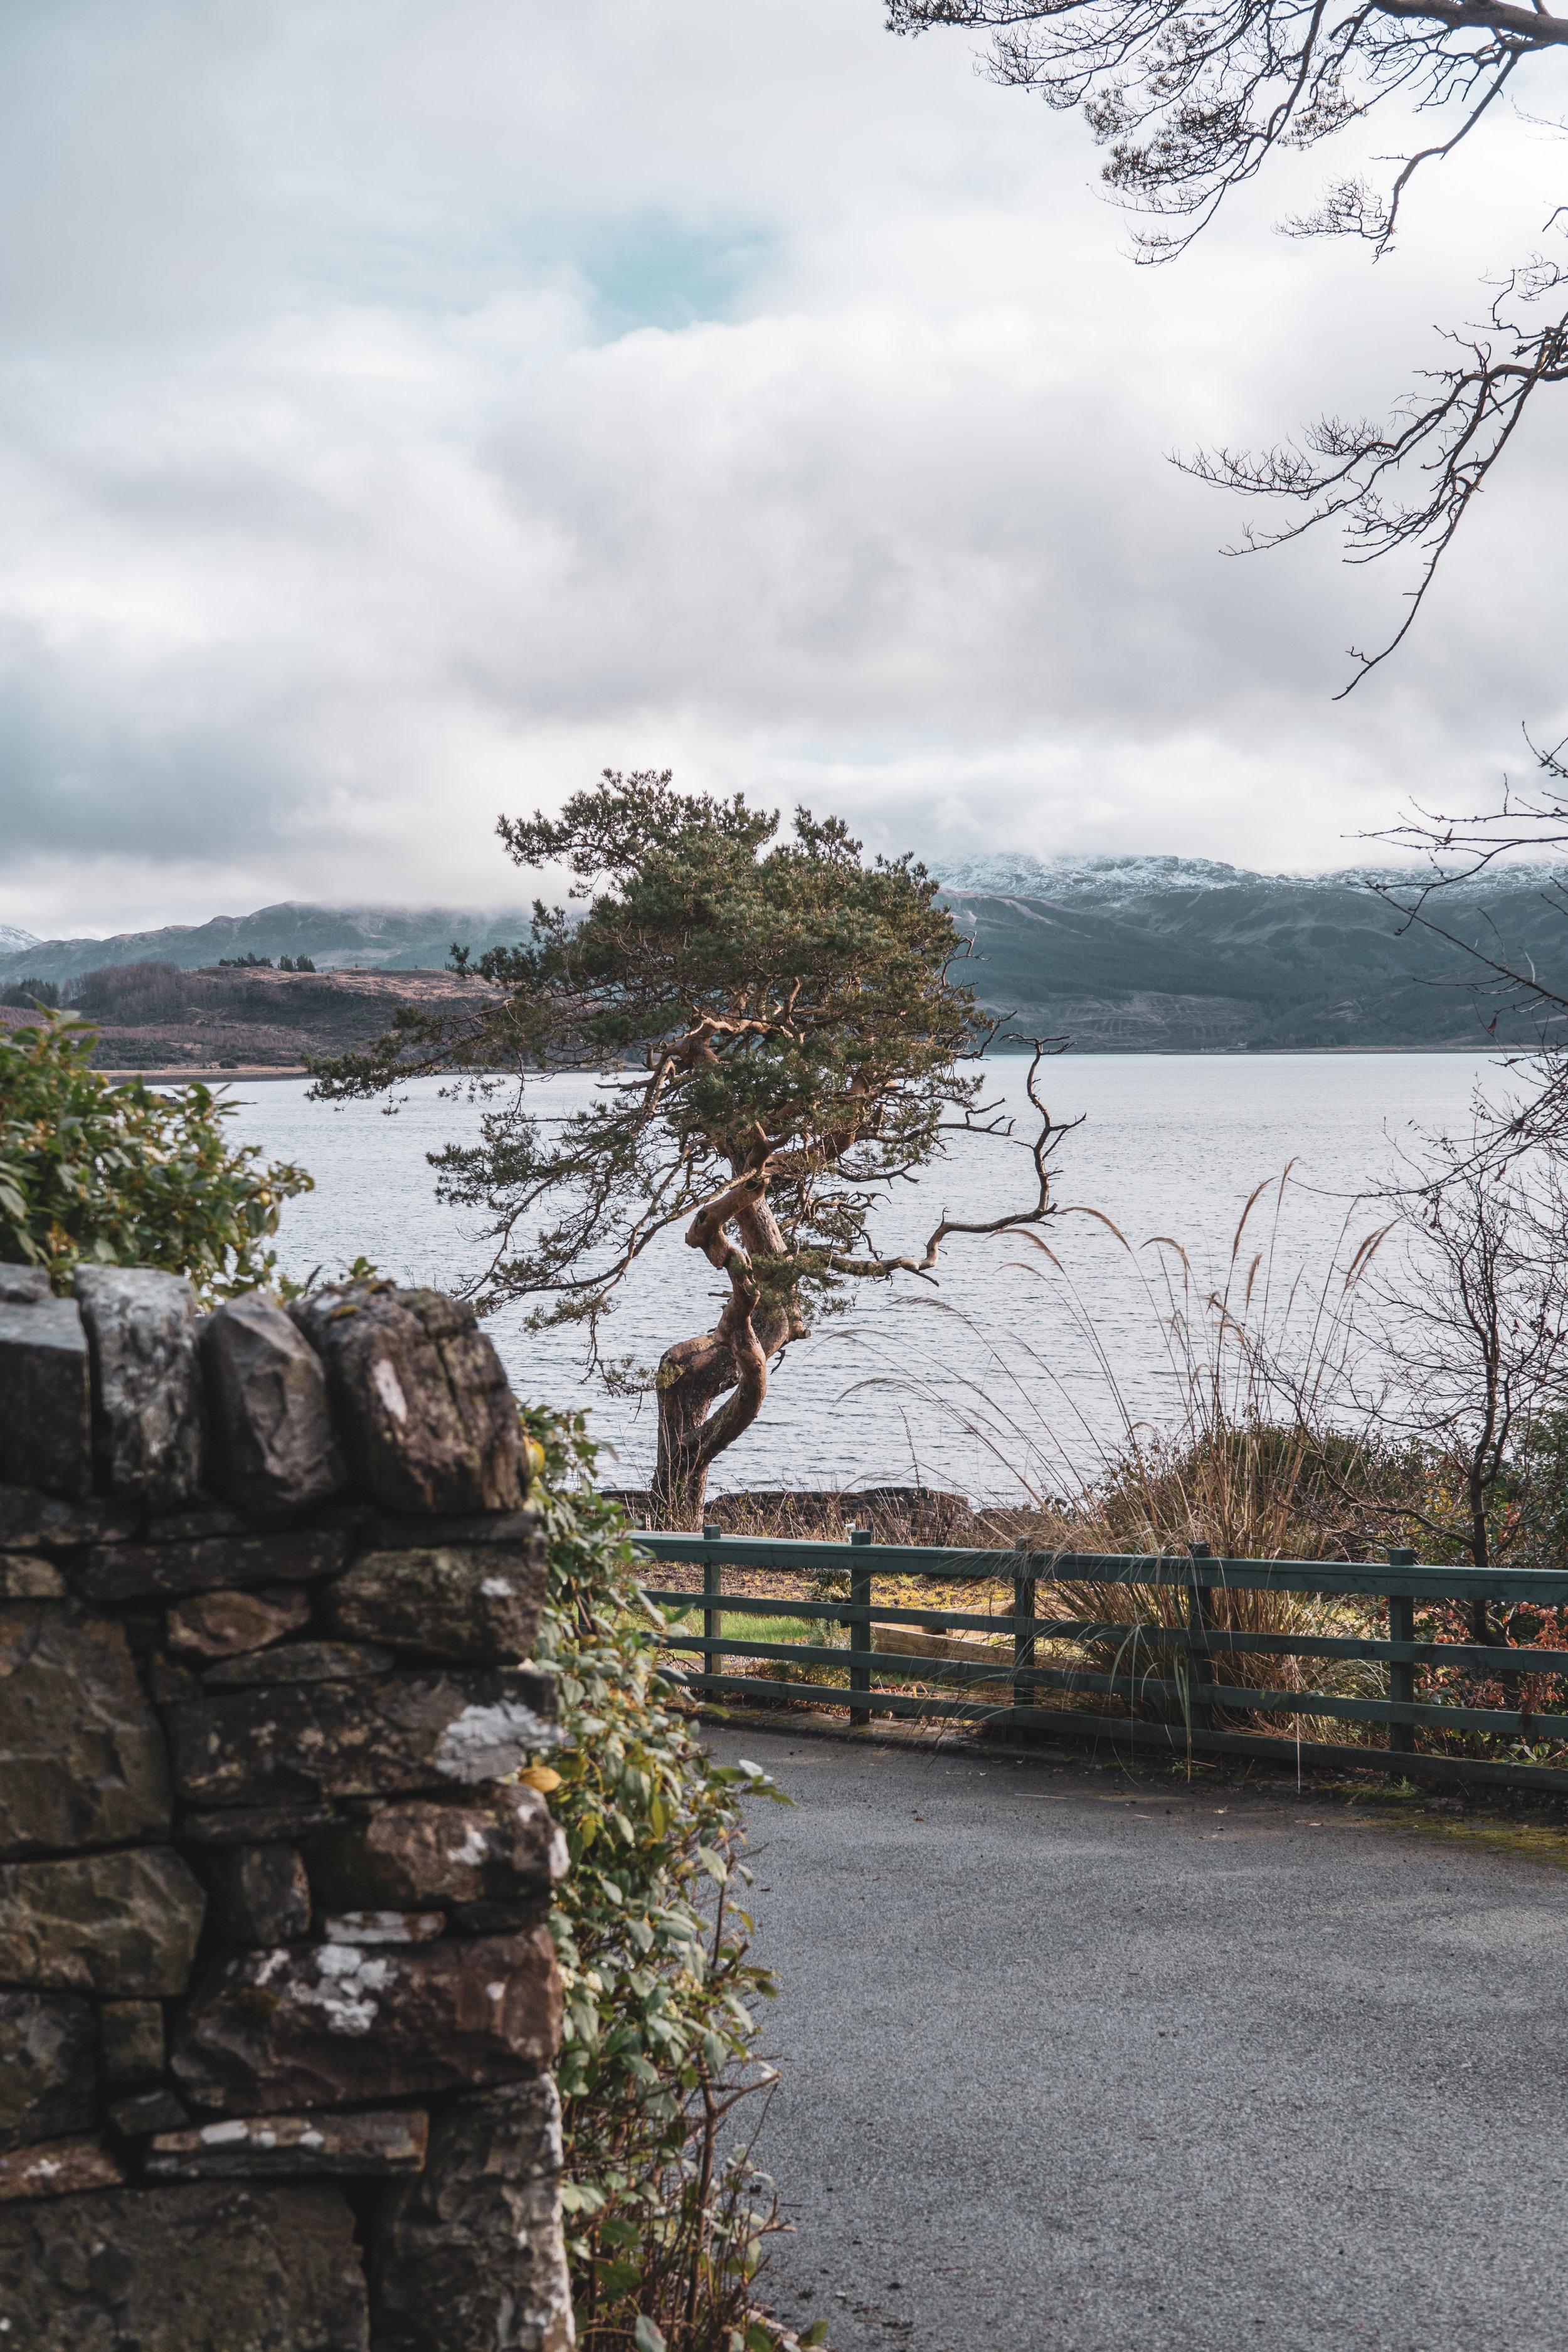 Isle-of-Skye-Eilean-Donan (2).jpg